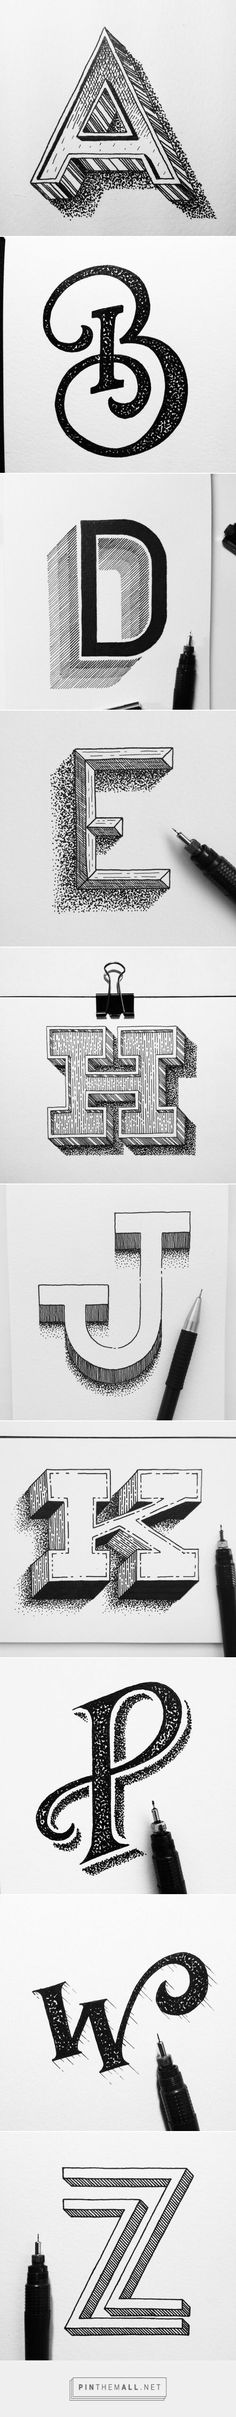 Sad that it's missing quite a few letters, but it's a good inspiration